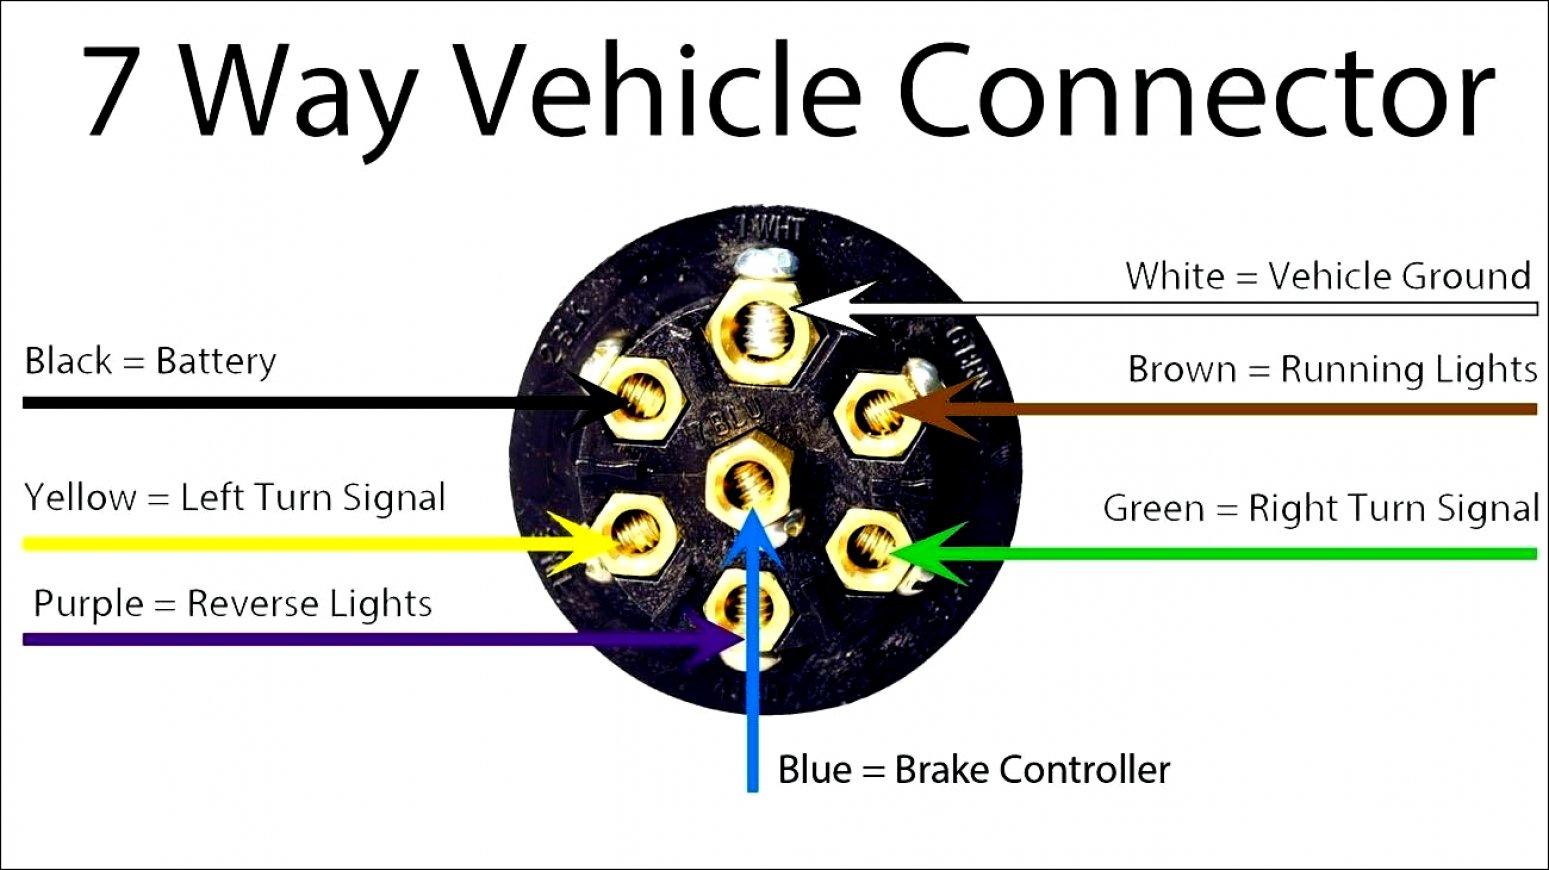 6 Pin Trailer Plug Wiring Diagram | Manual E-Books - Hopkins Trailer Plug Wiring Diagram